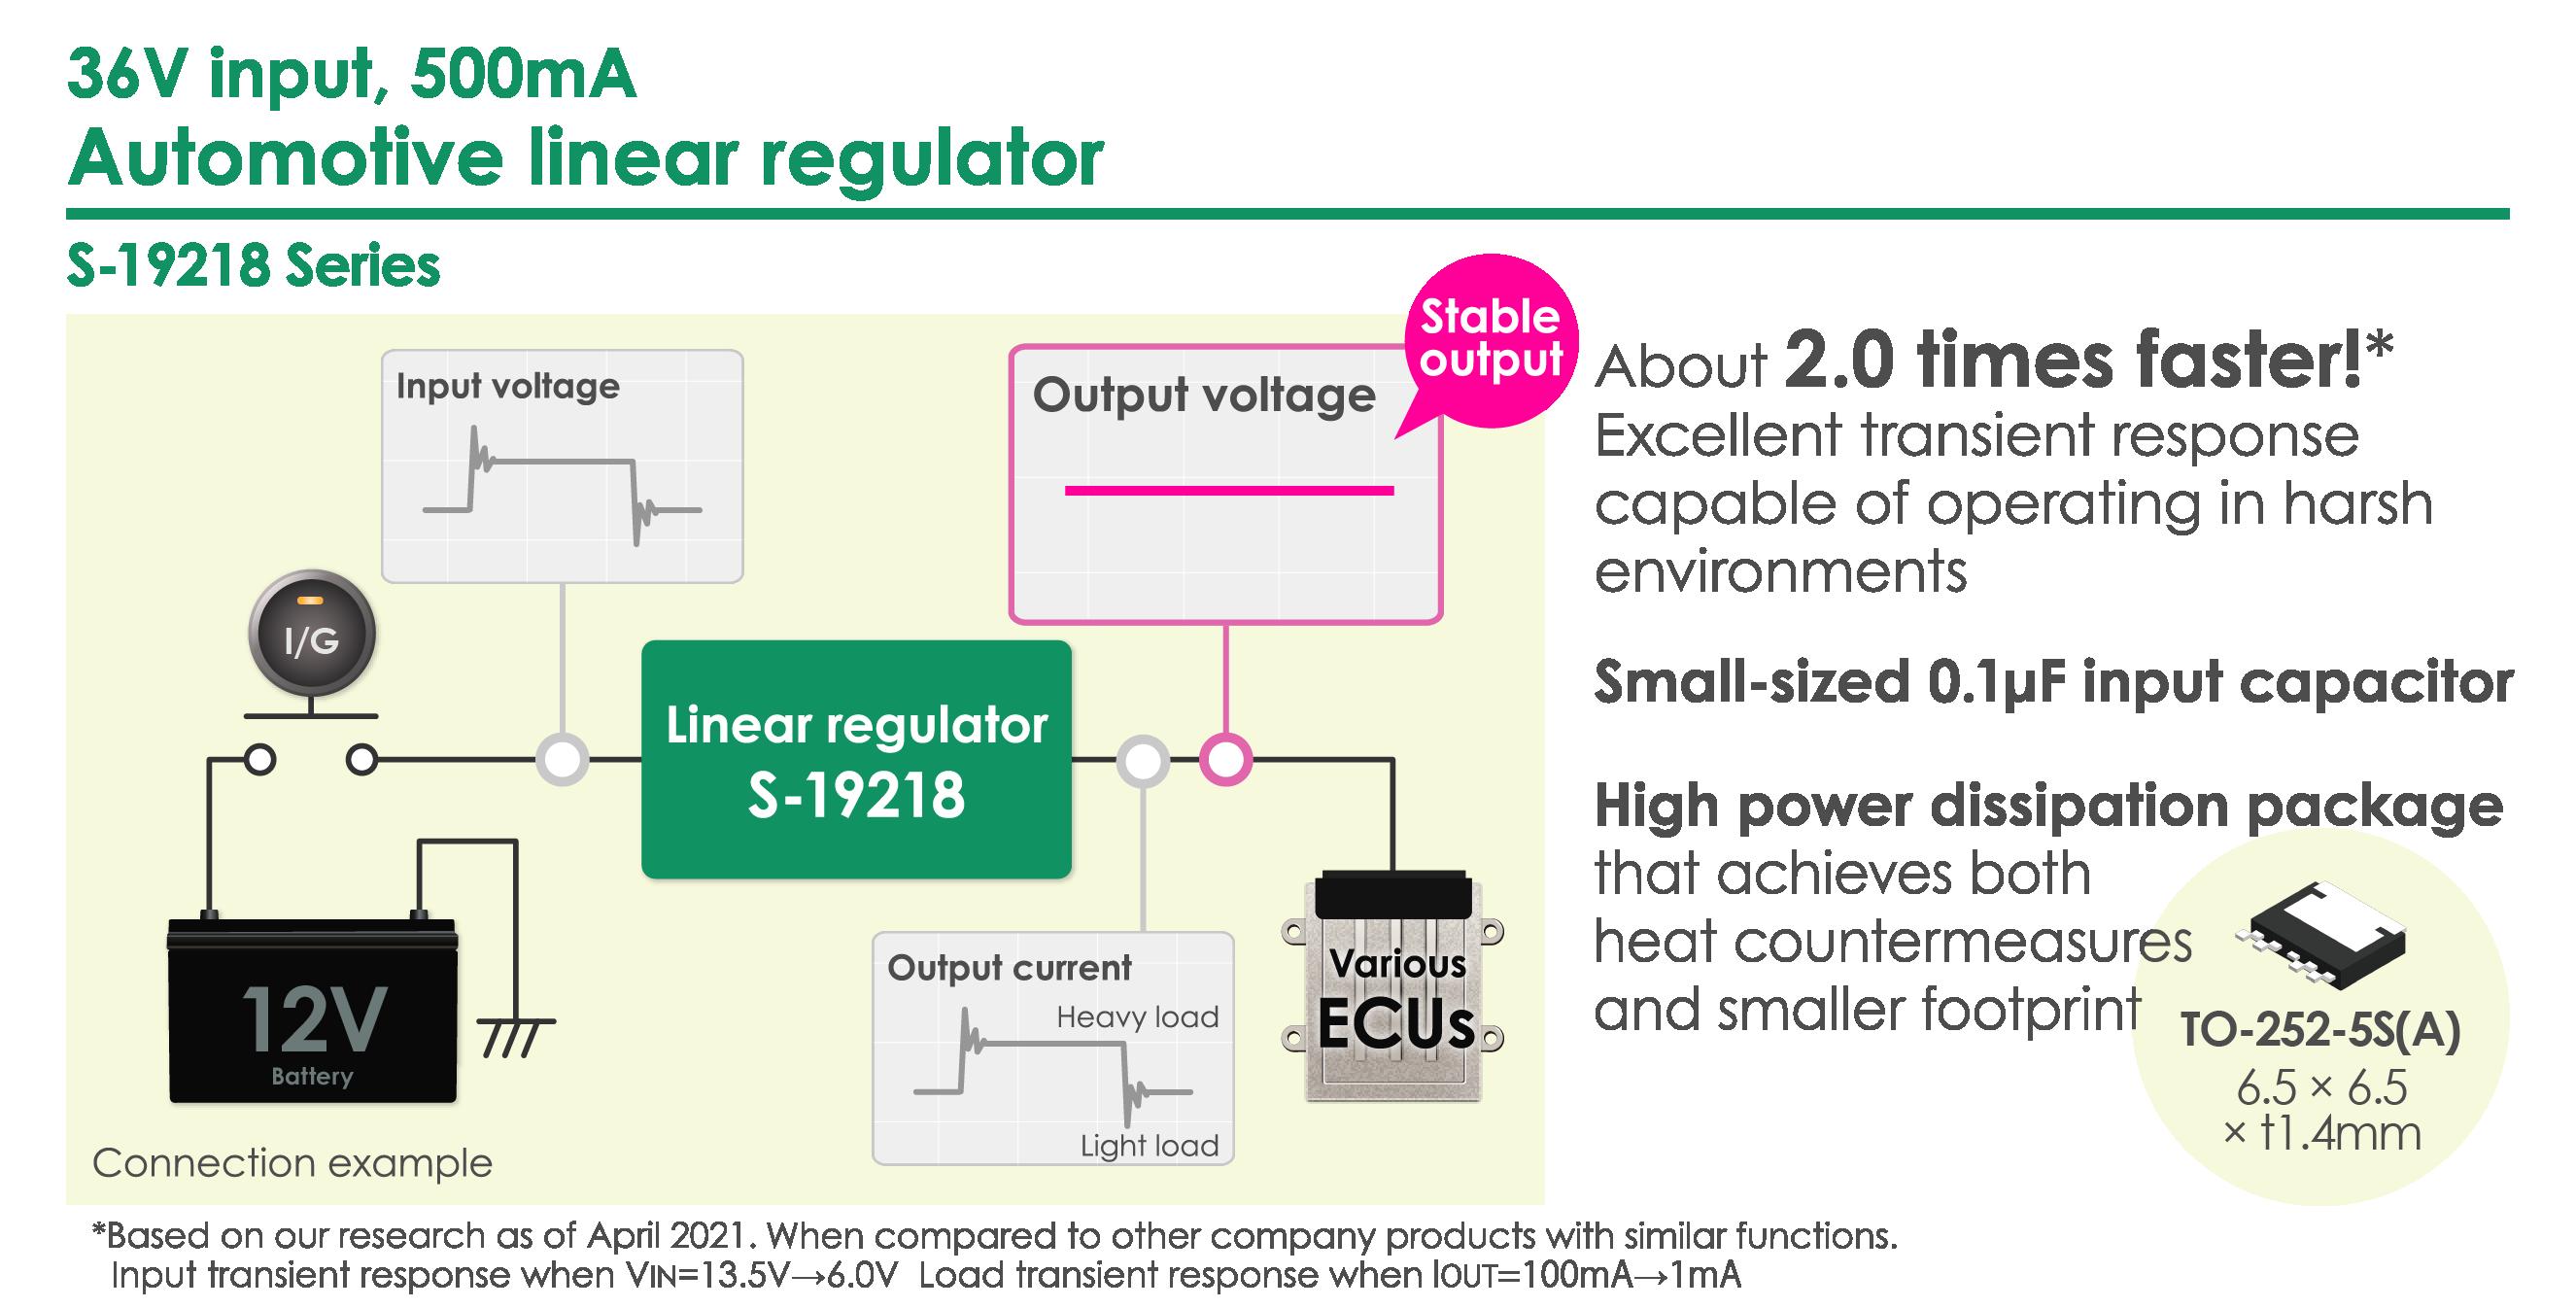 Automotive linear regulator S-19218 Series